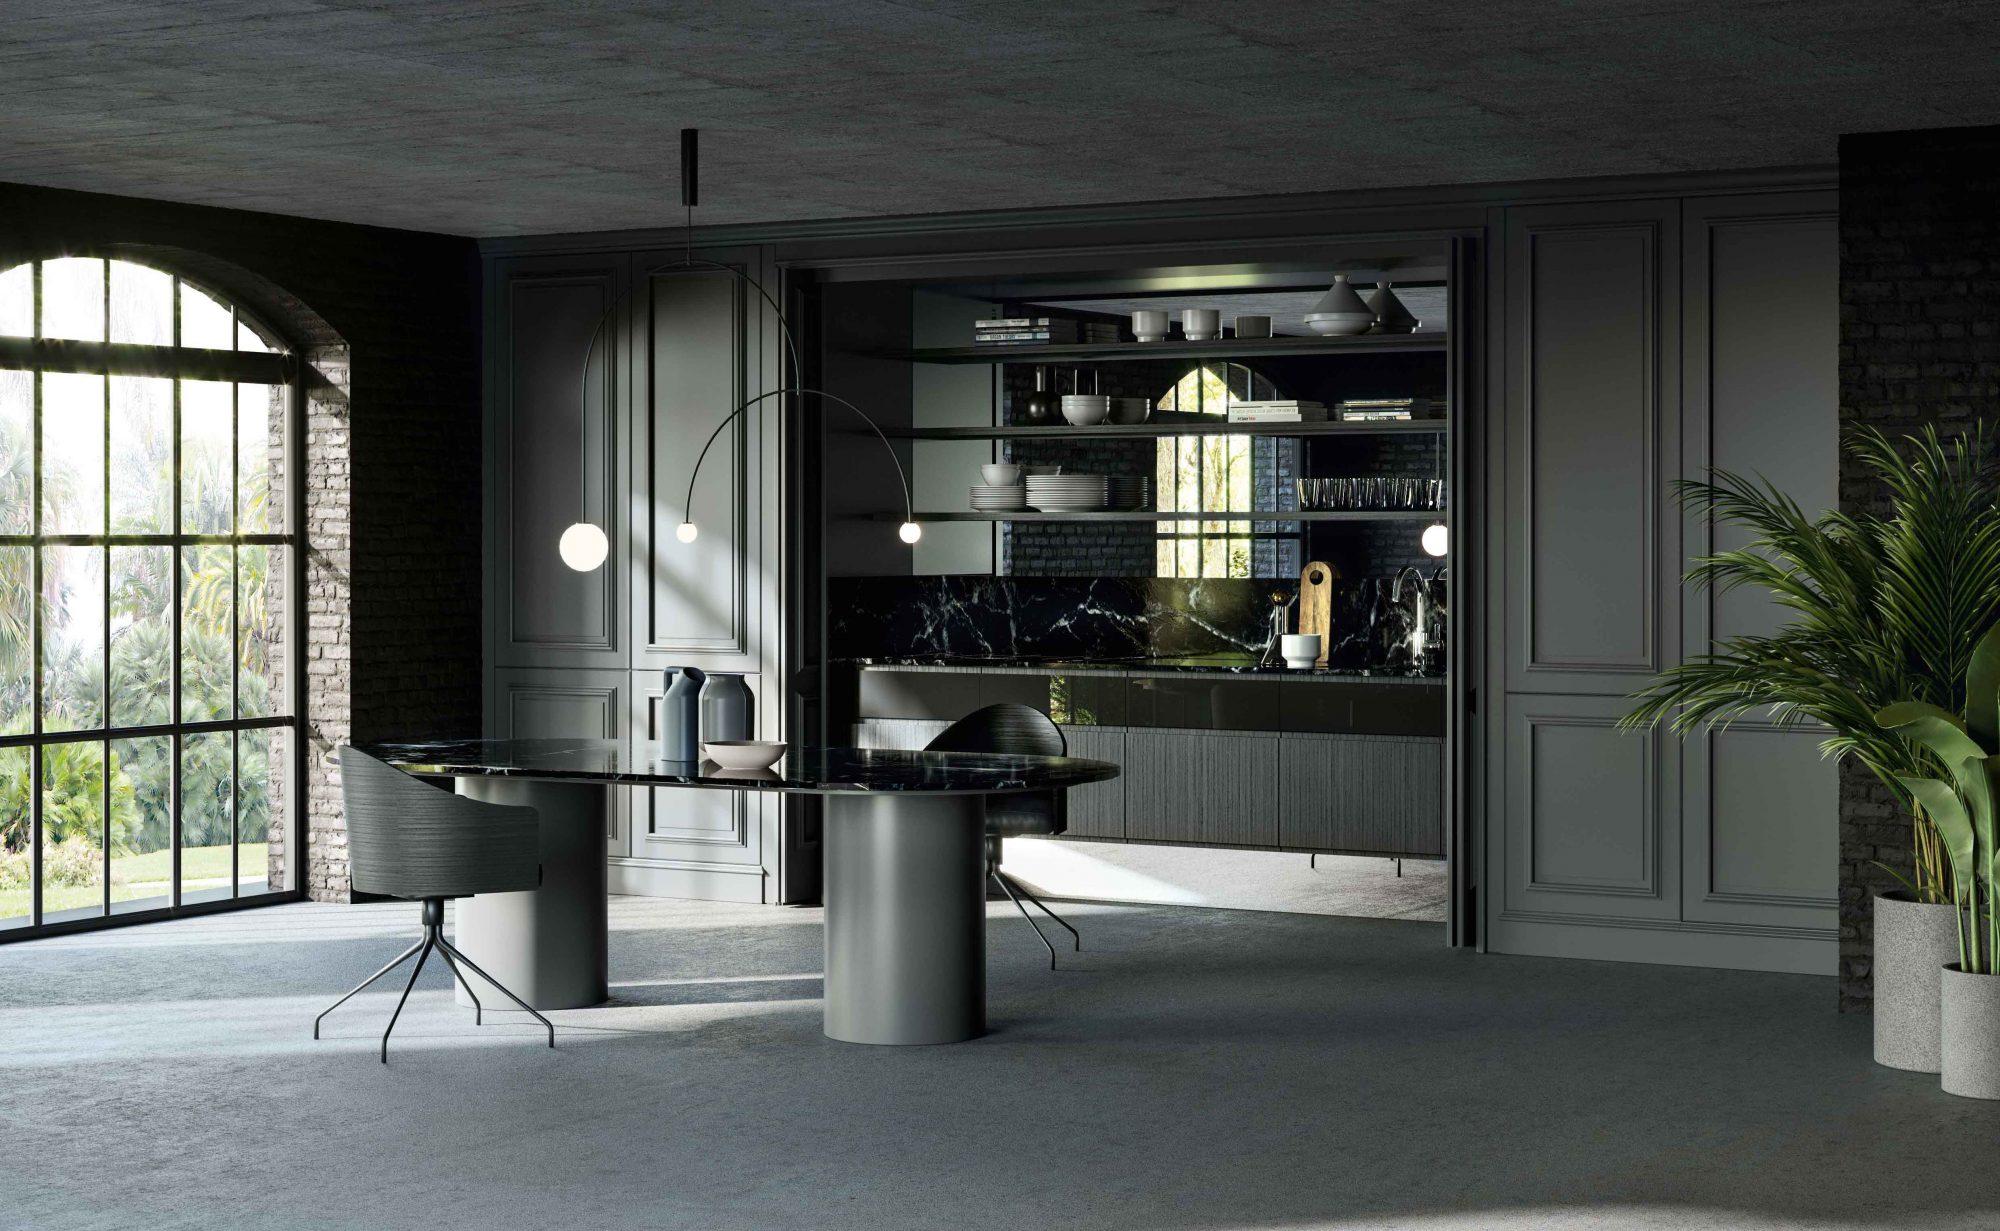 Boiserie Da Cucina : Cucina archetipo una cucina moderna con boiserie lottocento